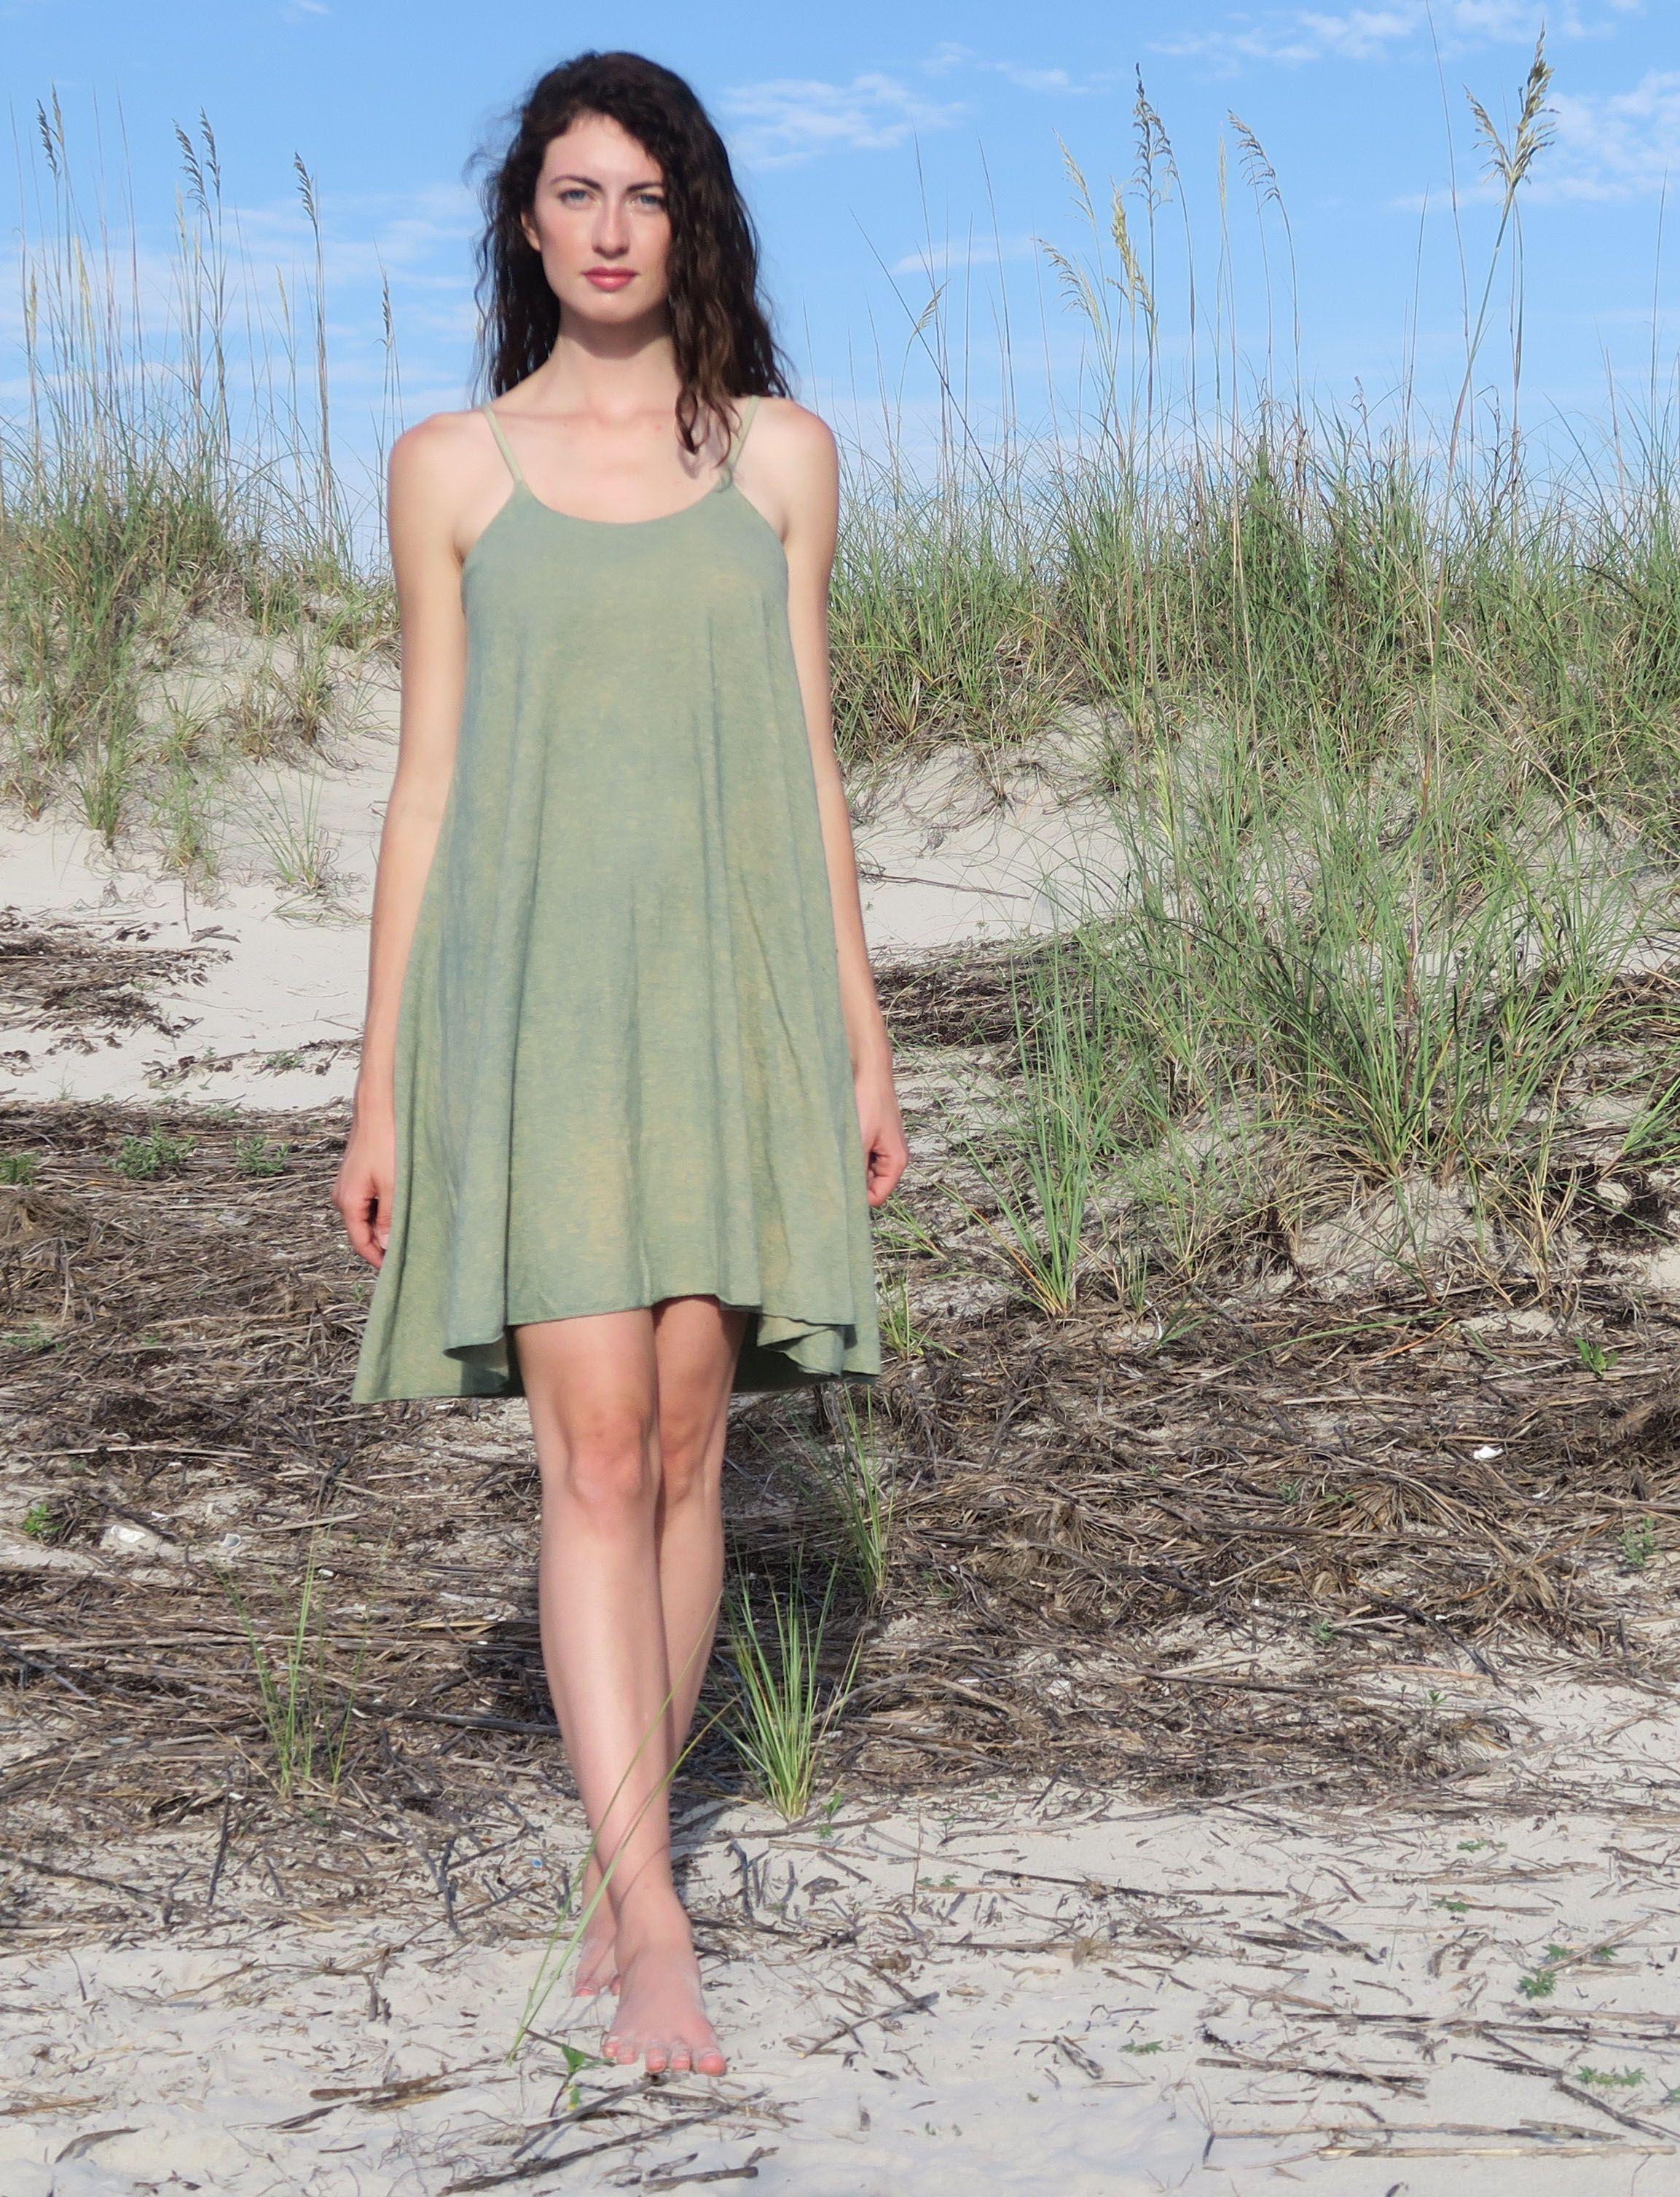 Adjustable Strap Built In Bra Wanderer Short Dress Gaia Conceptions Short Dresses Dresses Organic Cotton Knit [ 3016 x 2306 Pixel ]